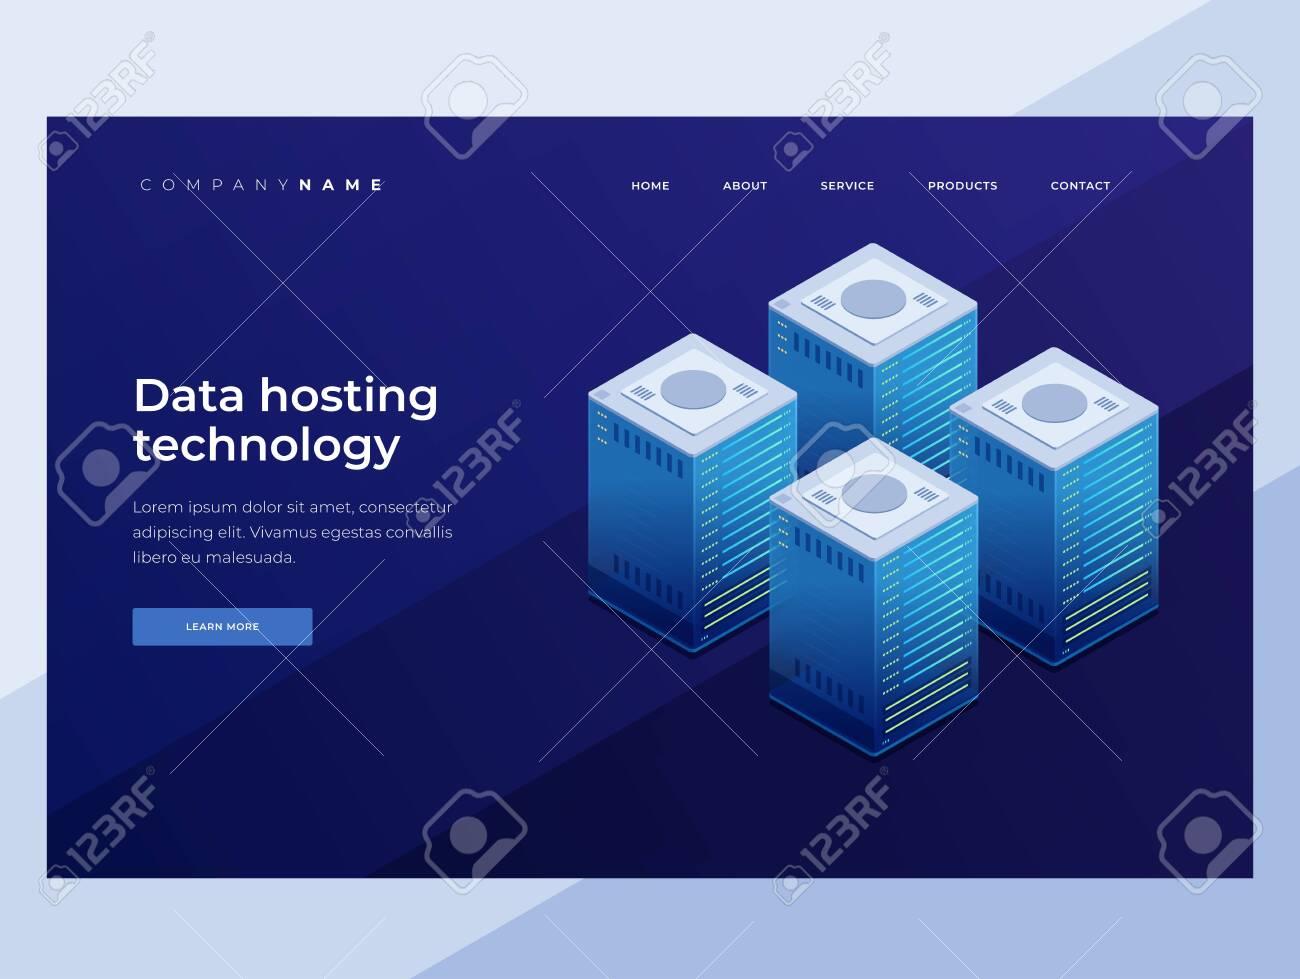 Internet equipment industry. Data transfer technology. Illustration of a network telecommunications server. 3D isometric design. Landing Page. - 151407076